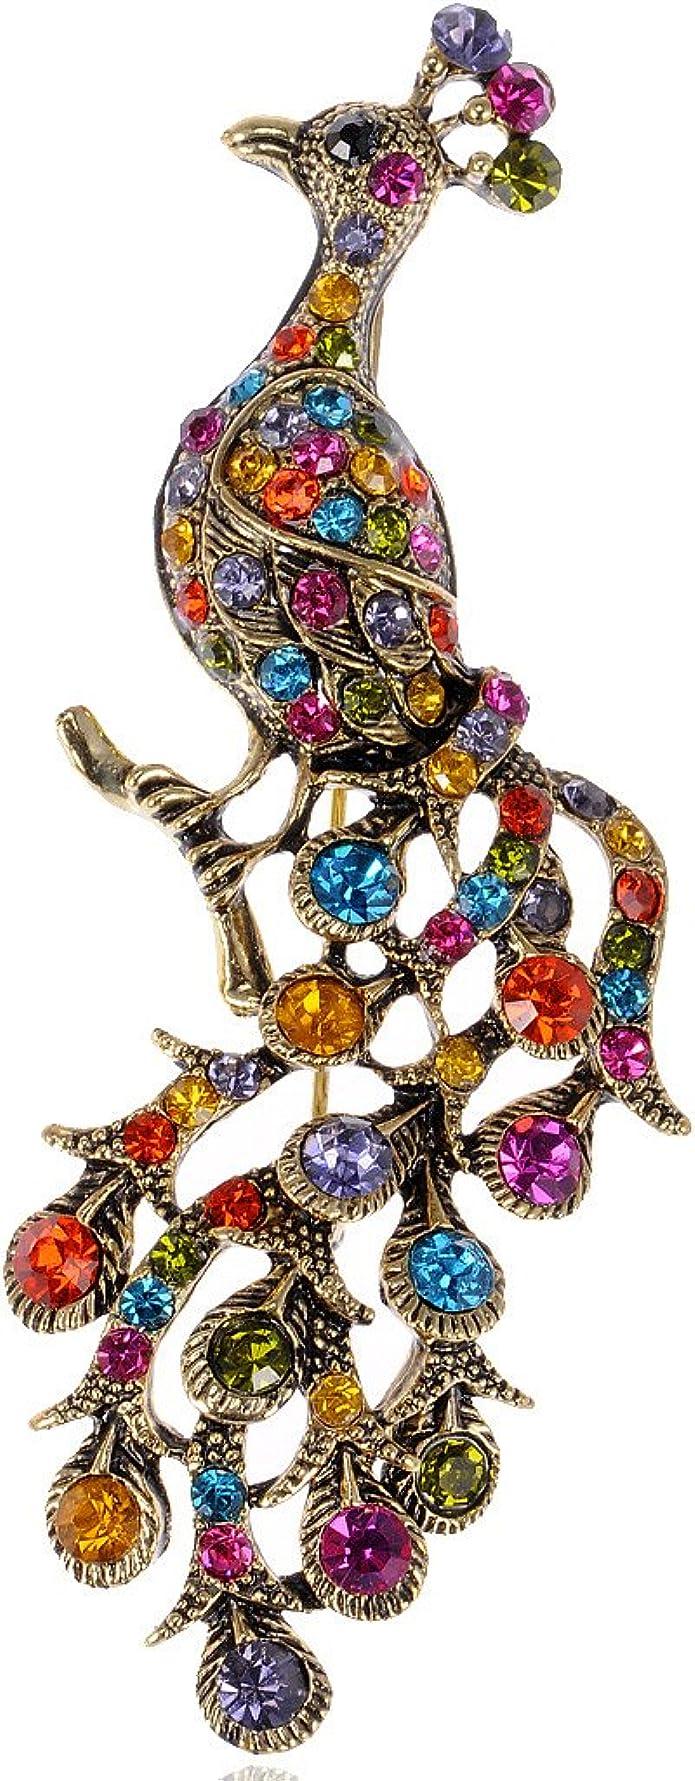 Silver Tone Multi-Coloured Crystal Peacock Brooch Peacock Broach Bird Pin Badge